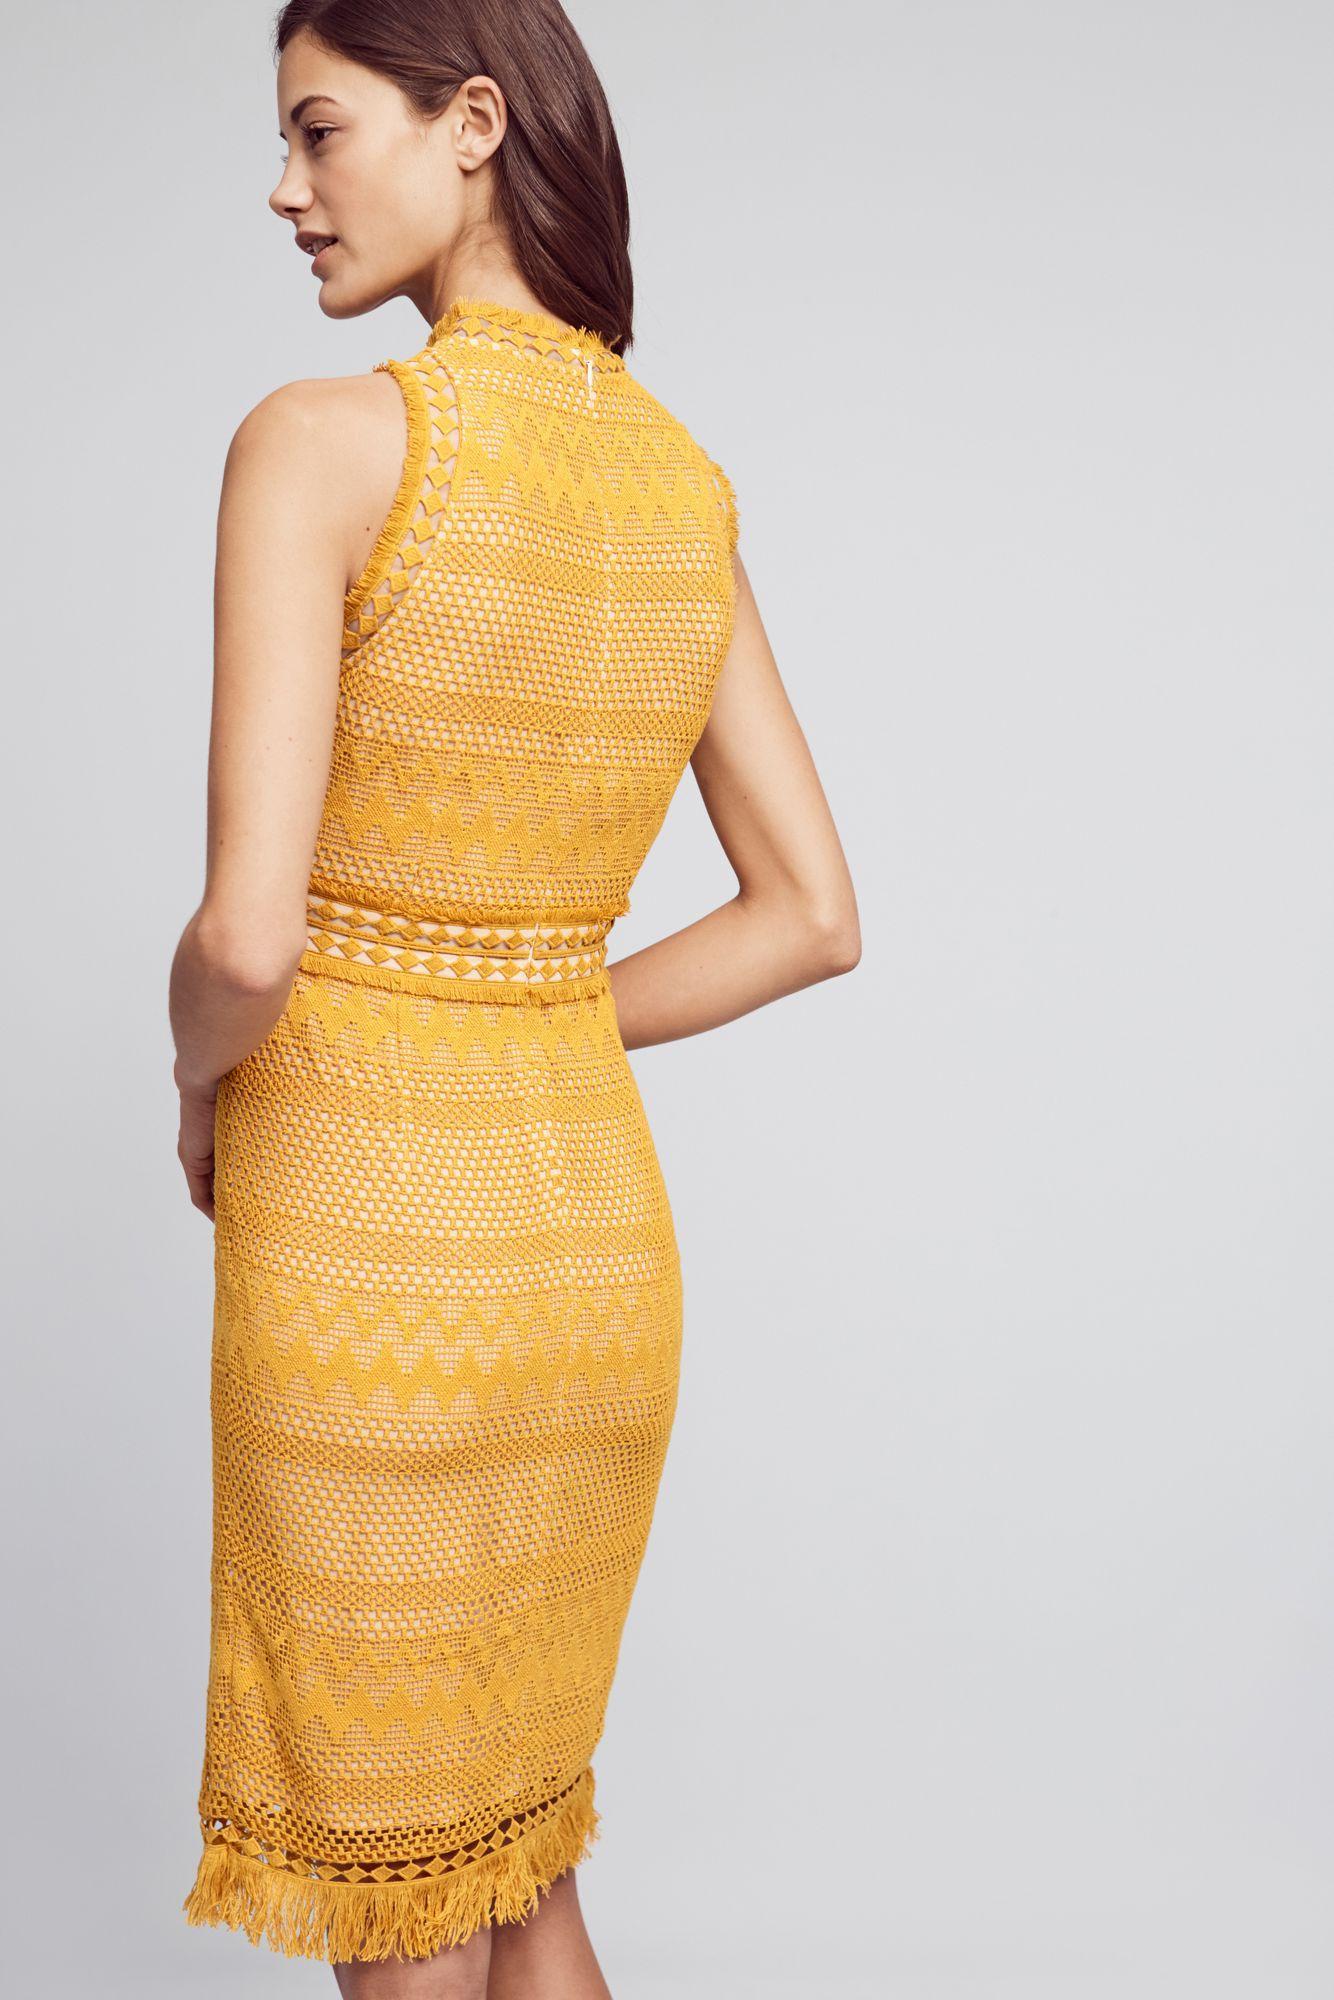 Shoshanna yellow dress